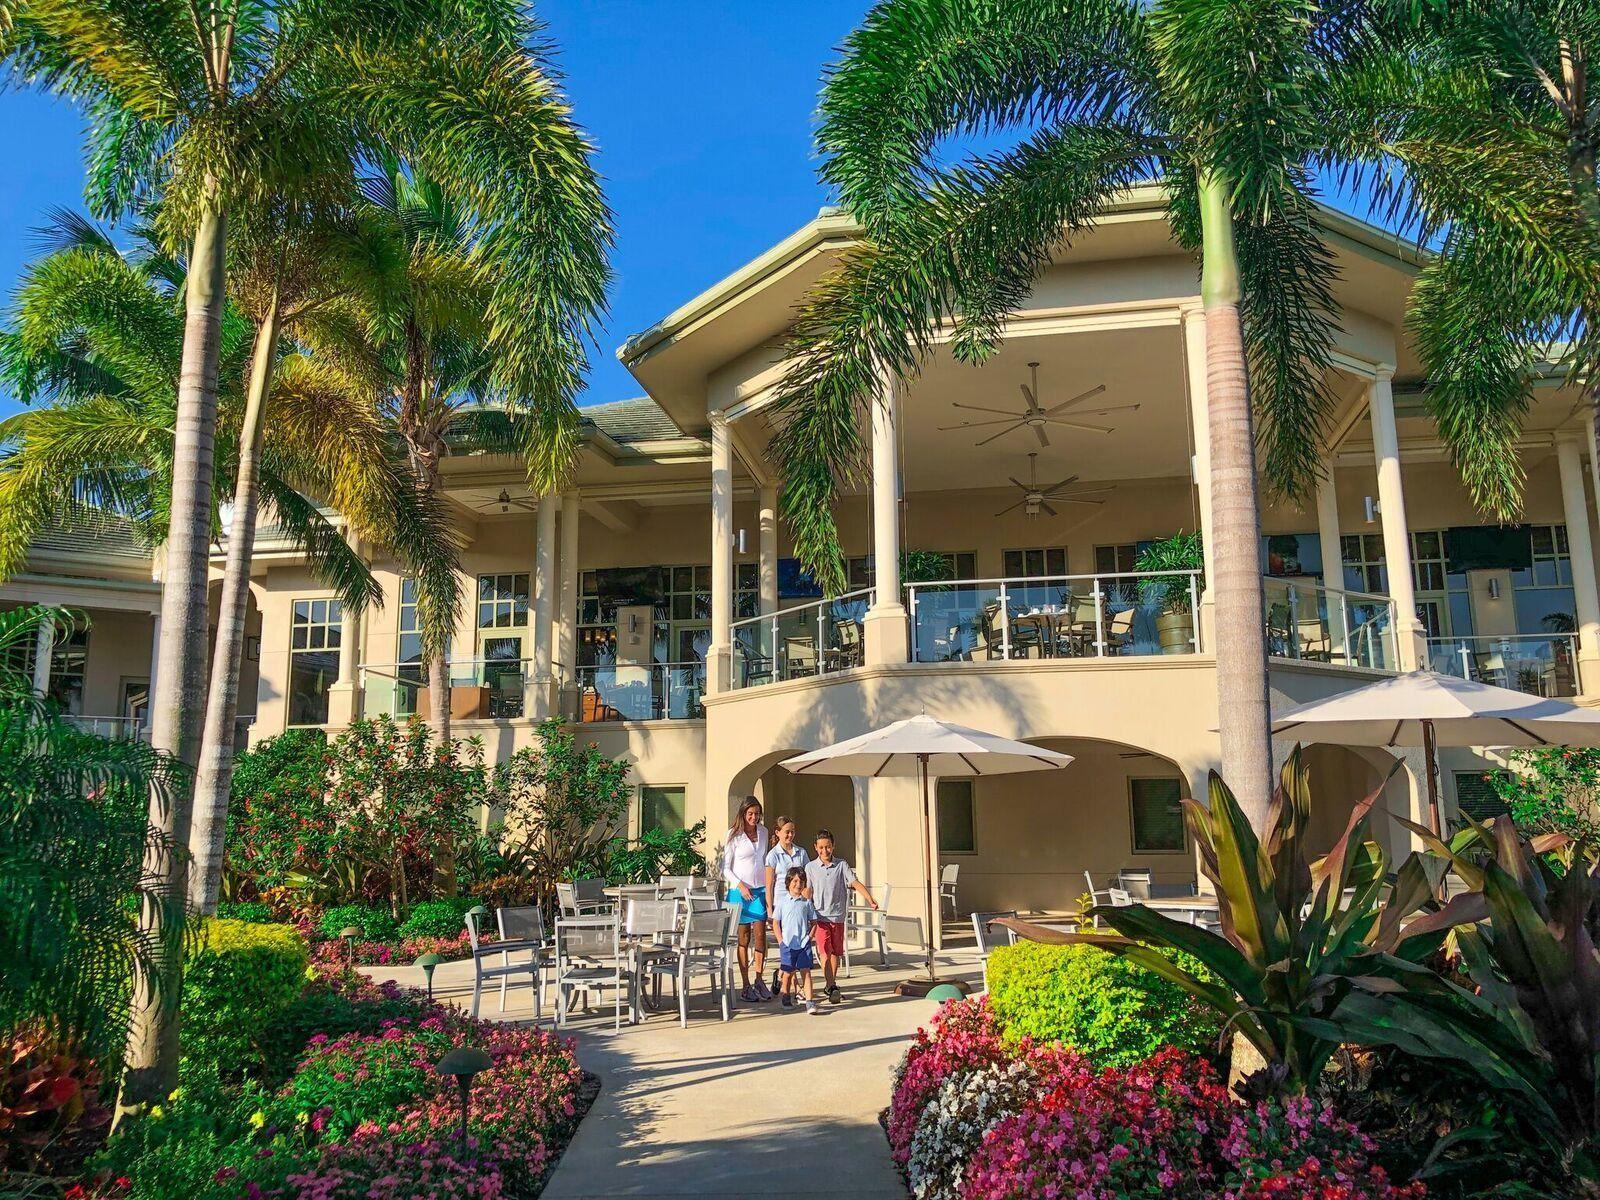 1102 Bridgewood Place, Boca Raton, FL 33434 - #: RX-10633419